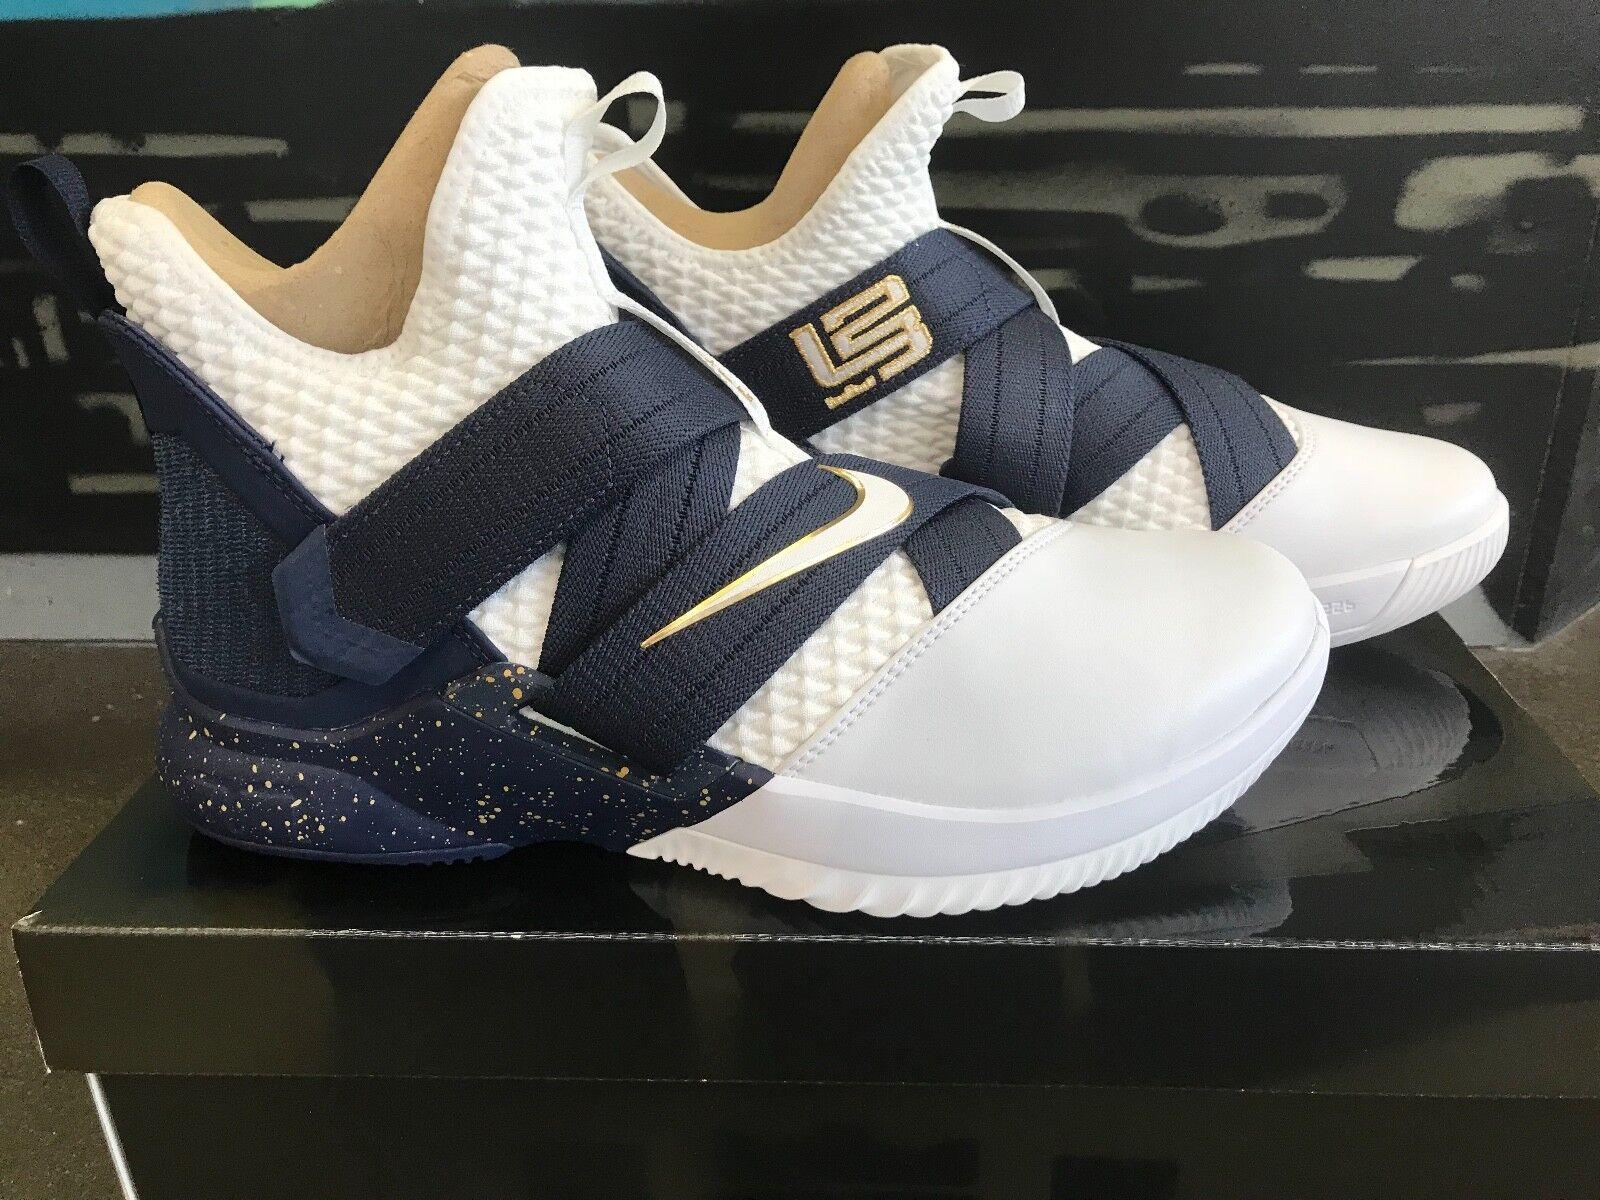 Nike lebron soldato xii sfg testimone ao4054-100 lebron james scarpe da basket pennino